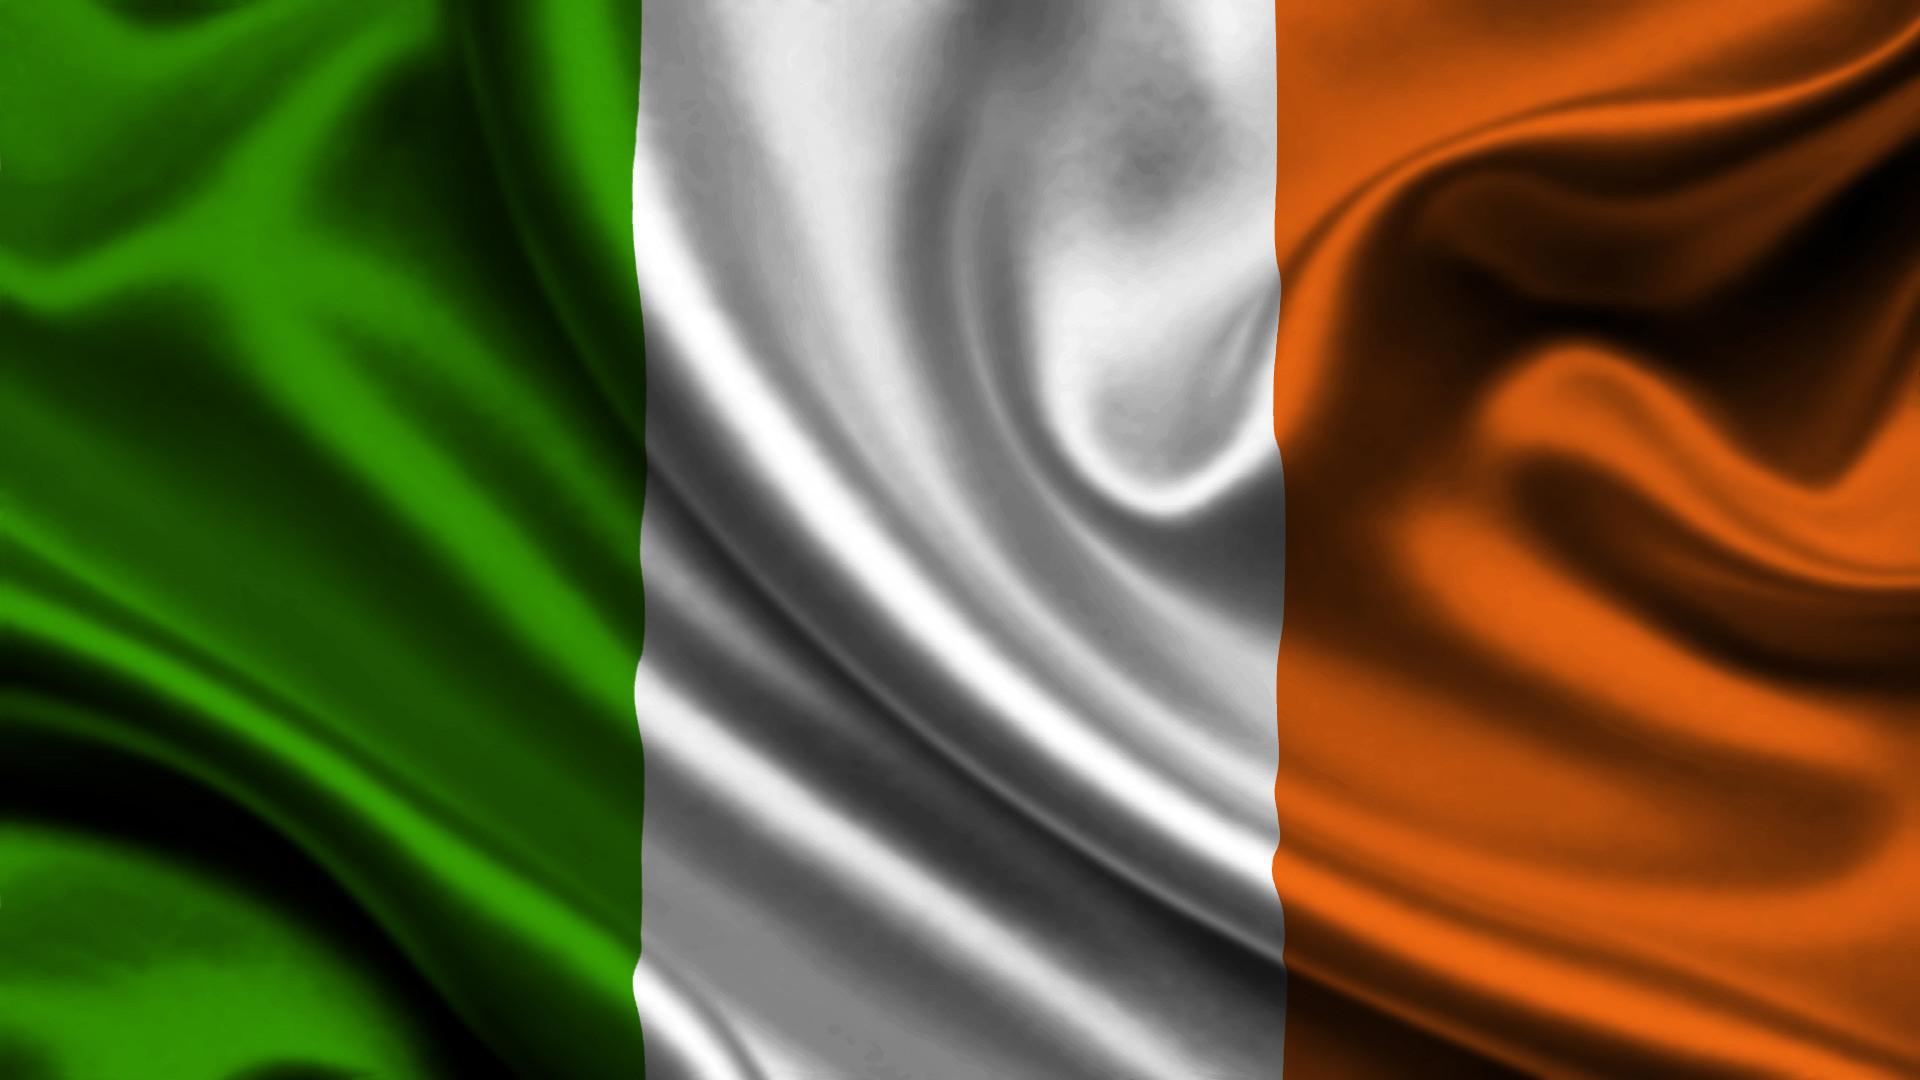 Res: 1920x1080, Free Ireland Wallpapers - WallpaperSafari